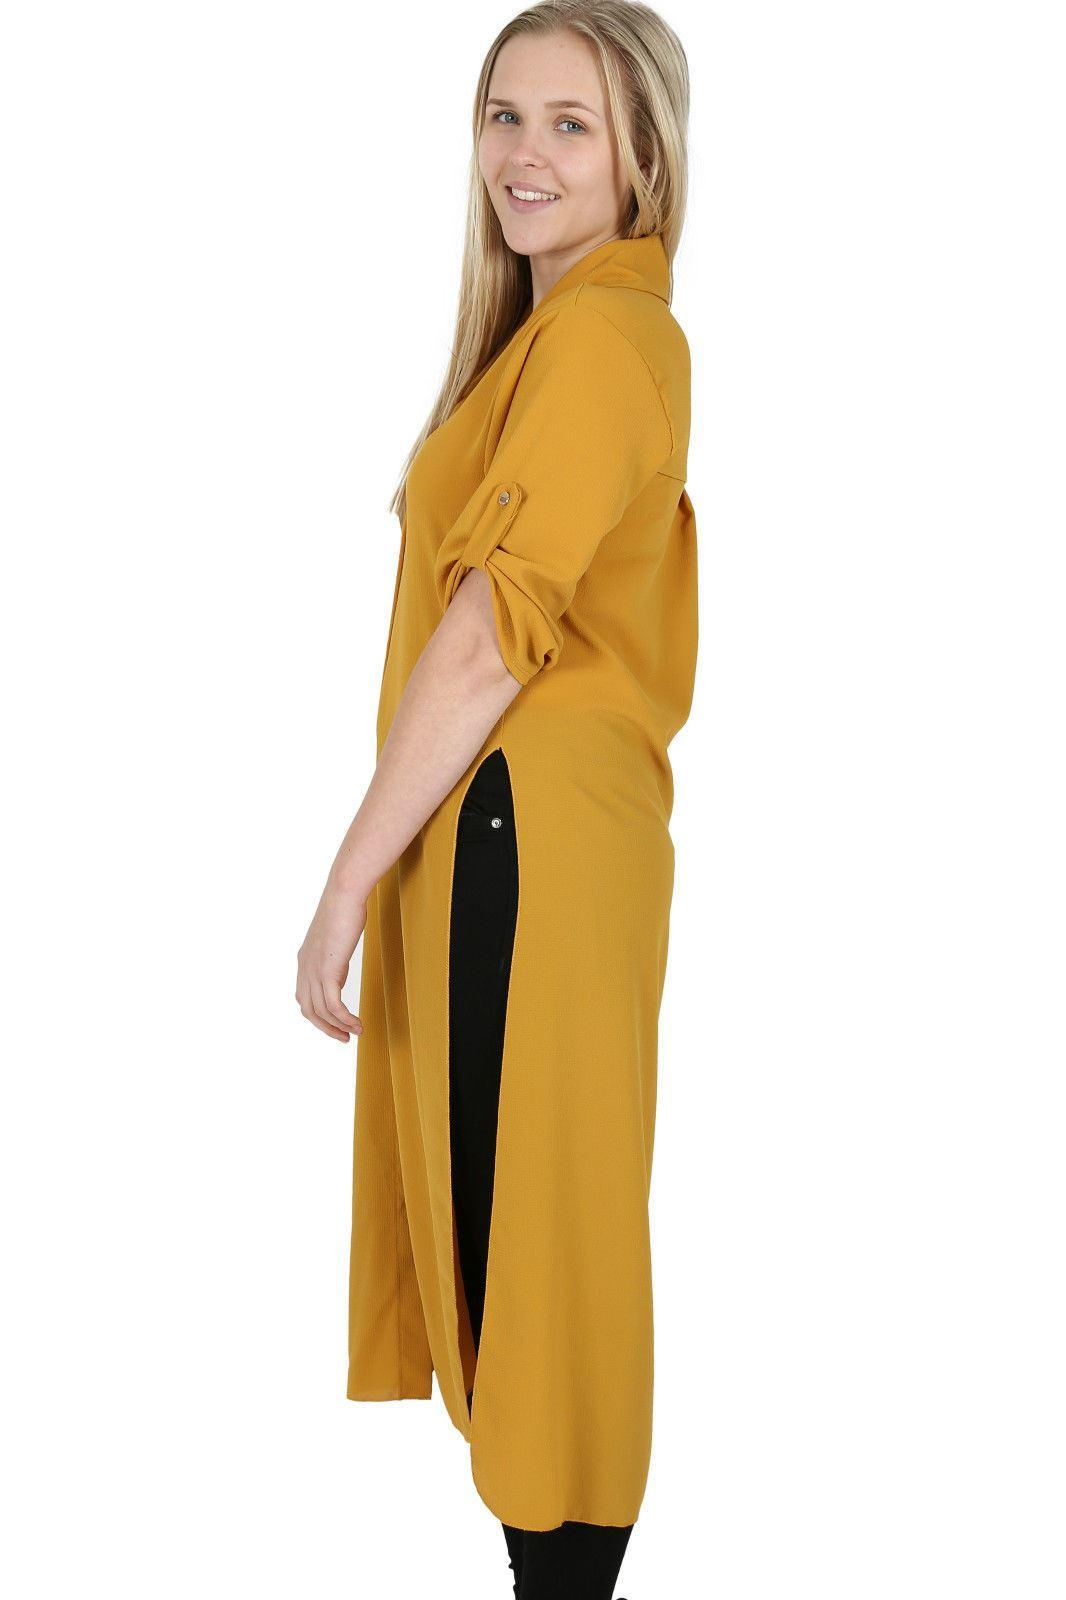 New Womens Plain Crepe Side Slit Button Collared Long Line Shirt Midi Dress Top